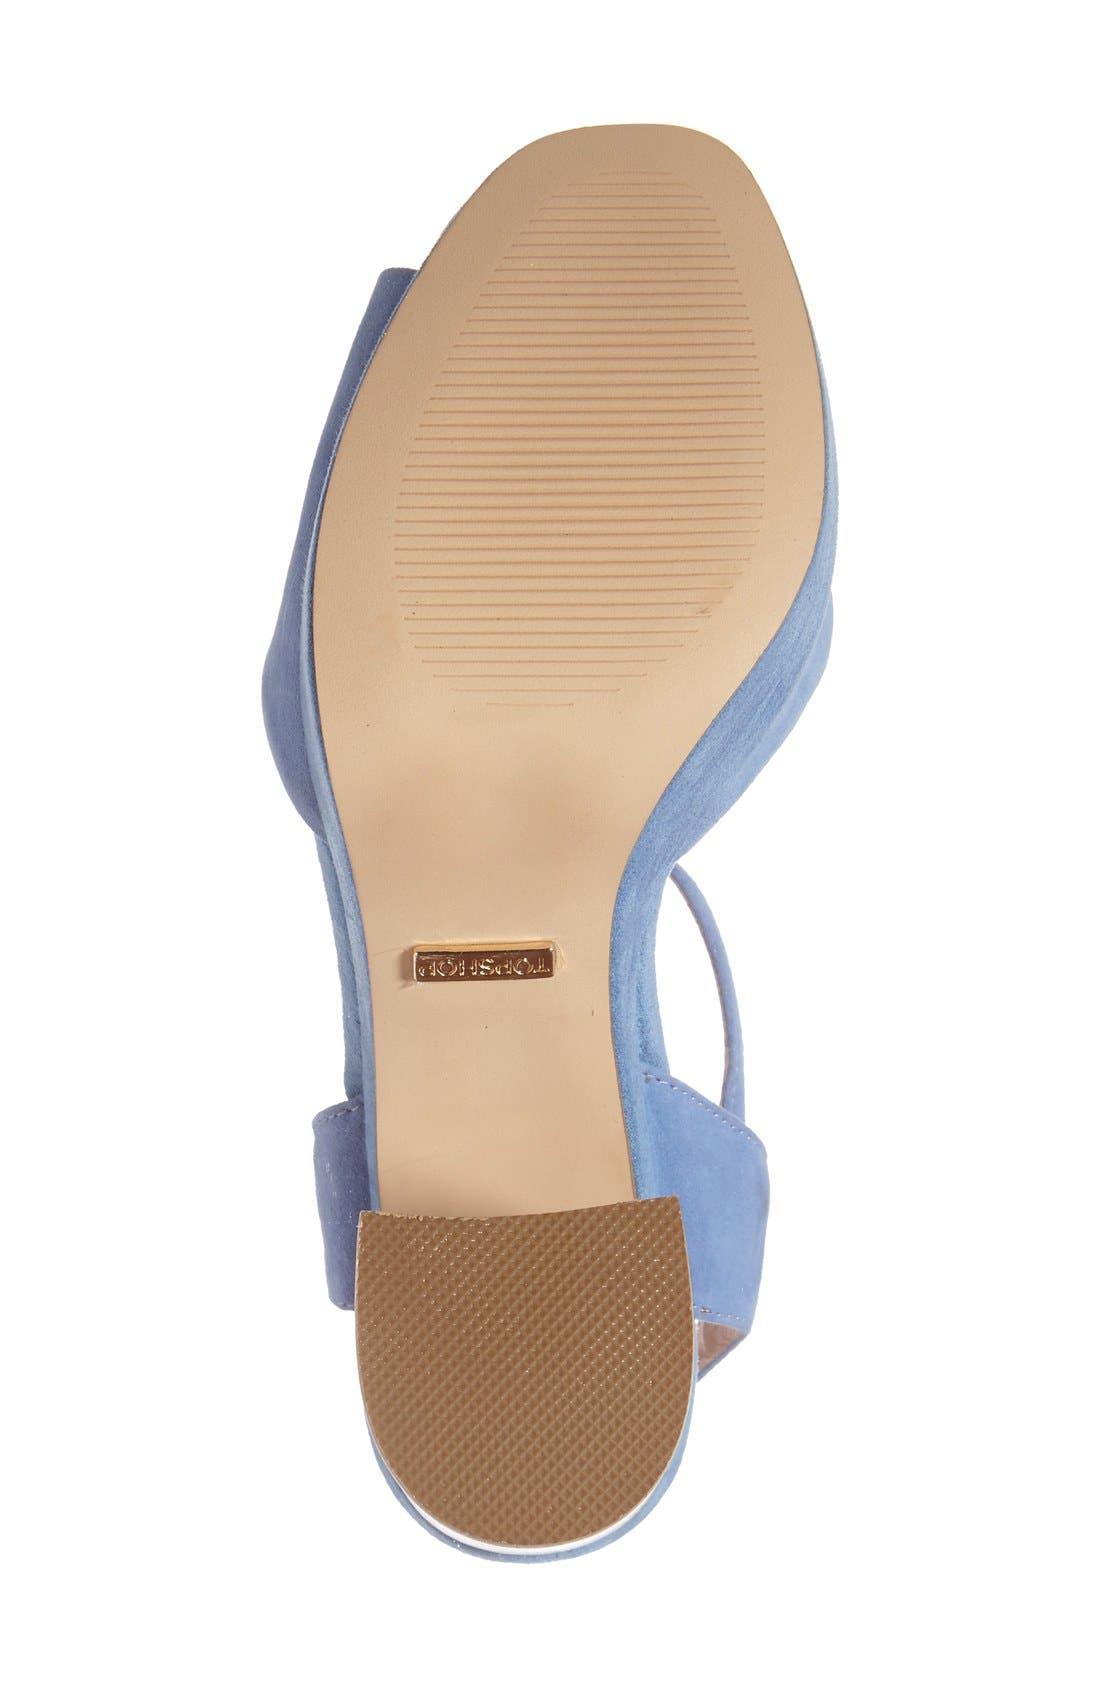 'Lana' Chunky Platform Sandal,                             Alternate thumbnail 4, color,                             Blue